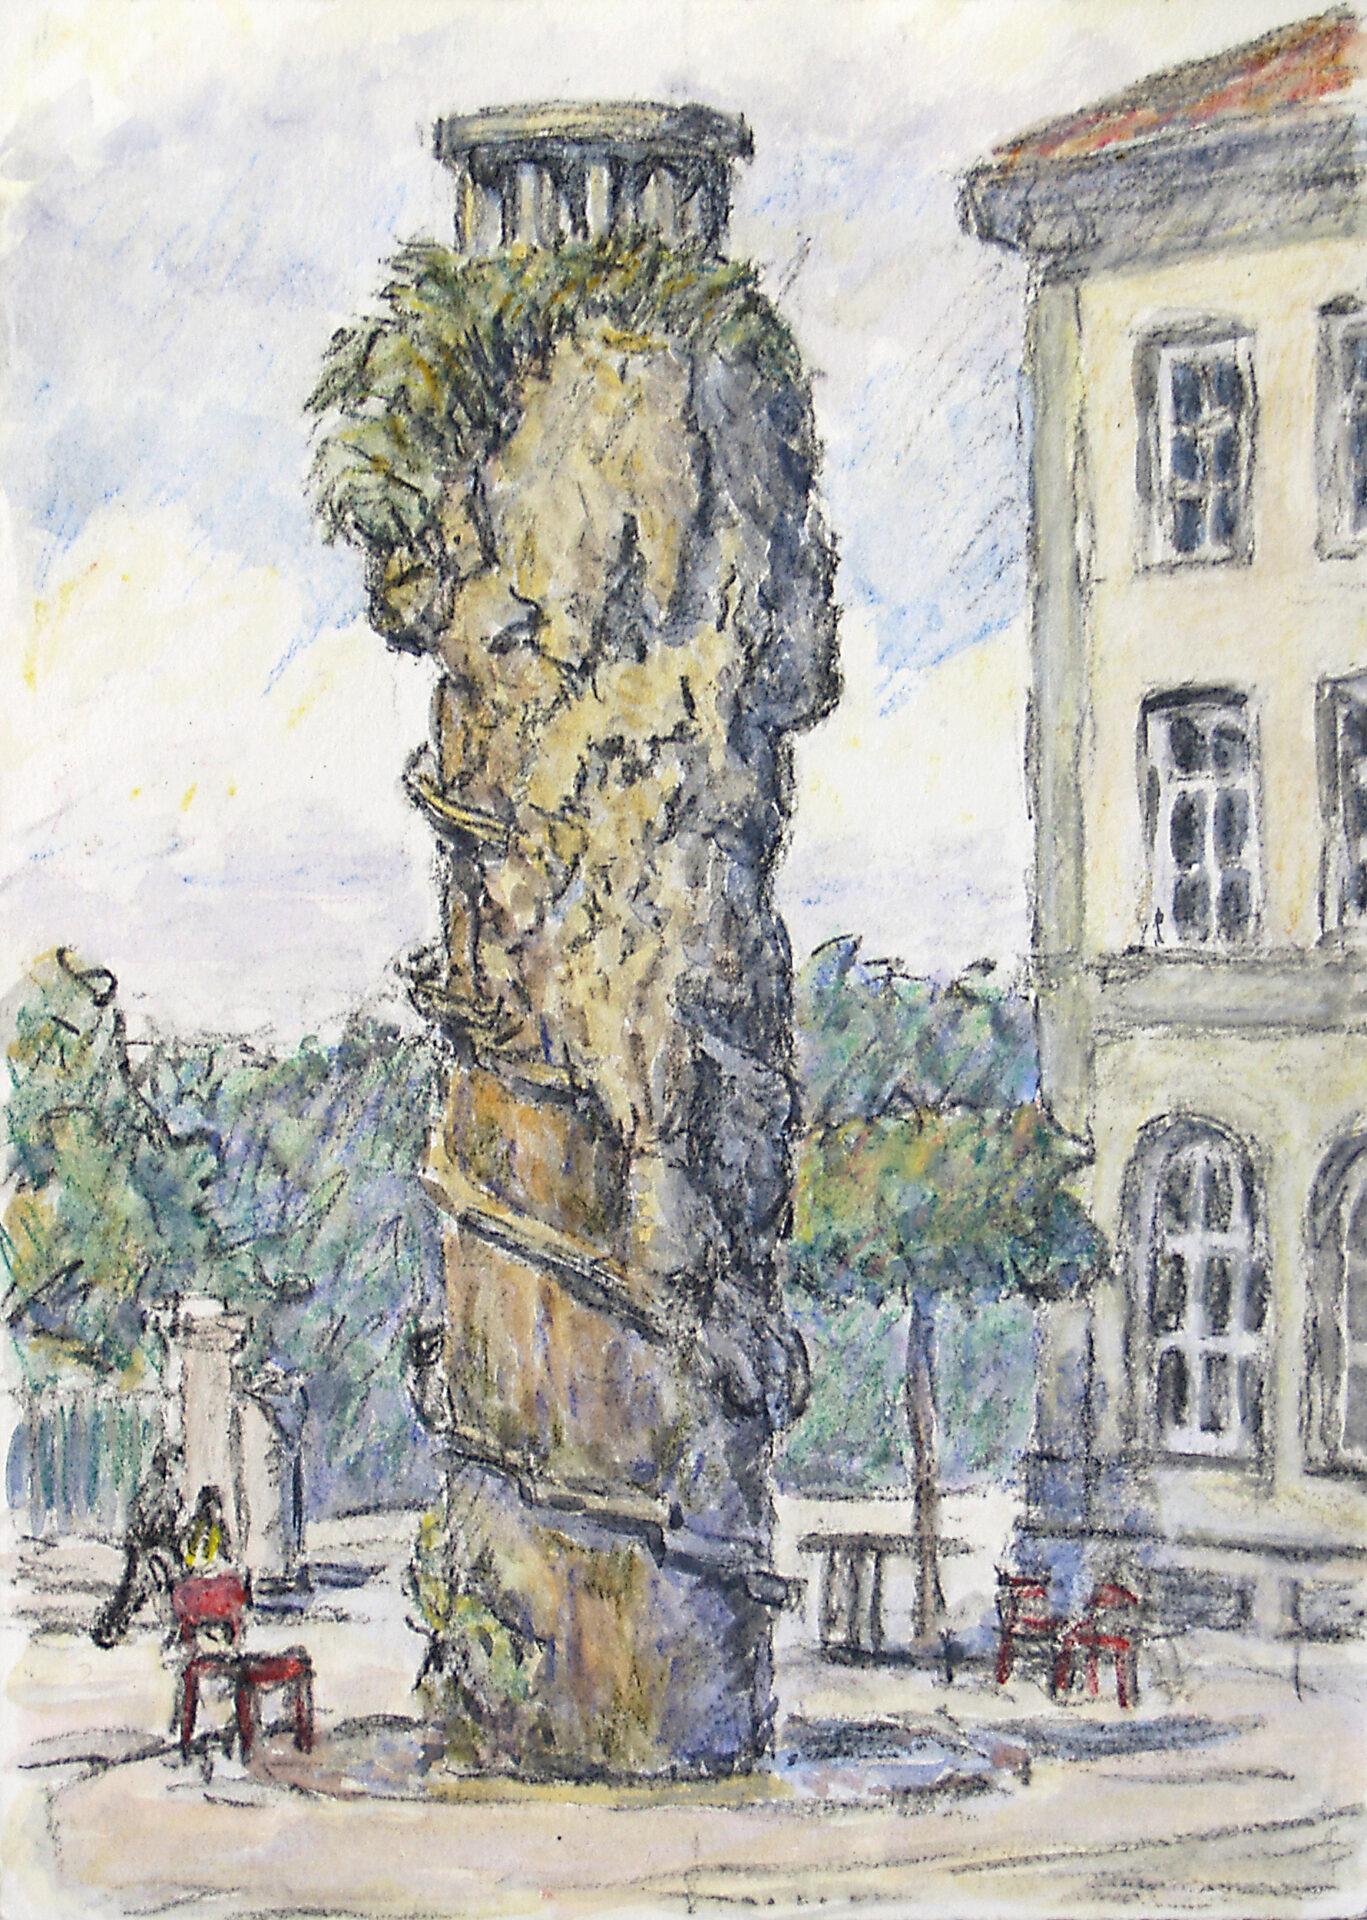 Bern Waisenhausplatz, Meret Oppenheim Brunnen